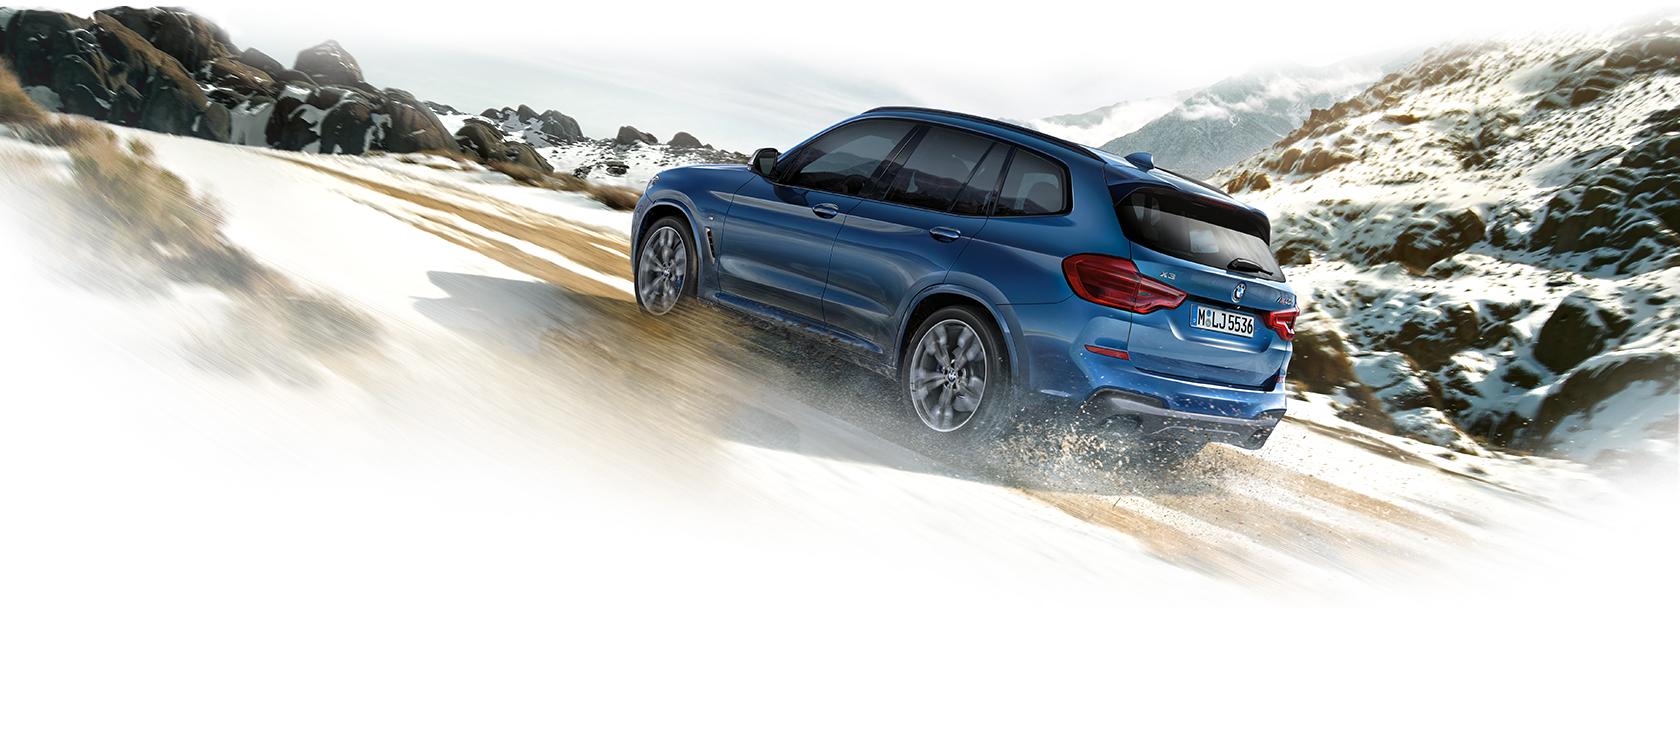 BMW X3 offroad